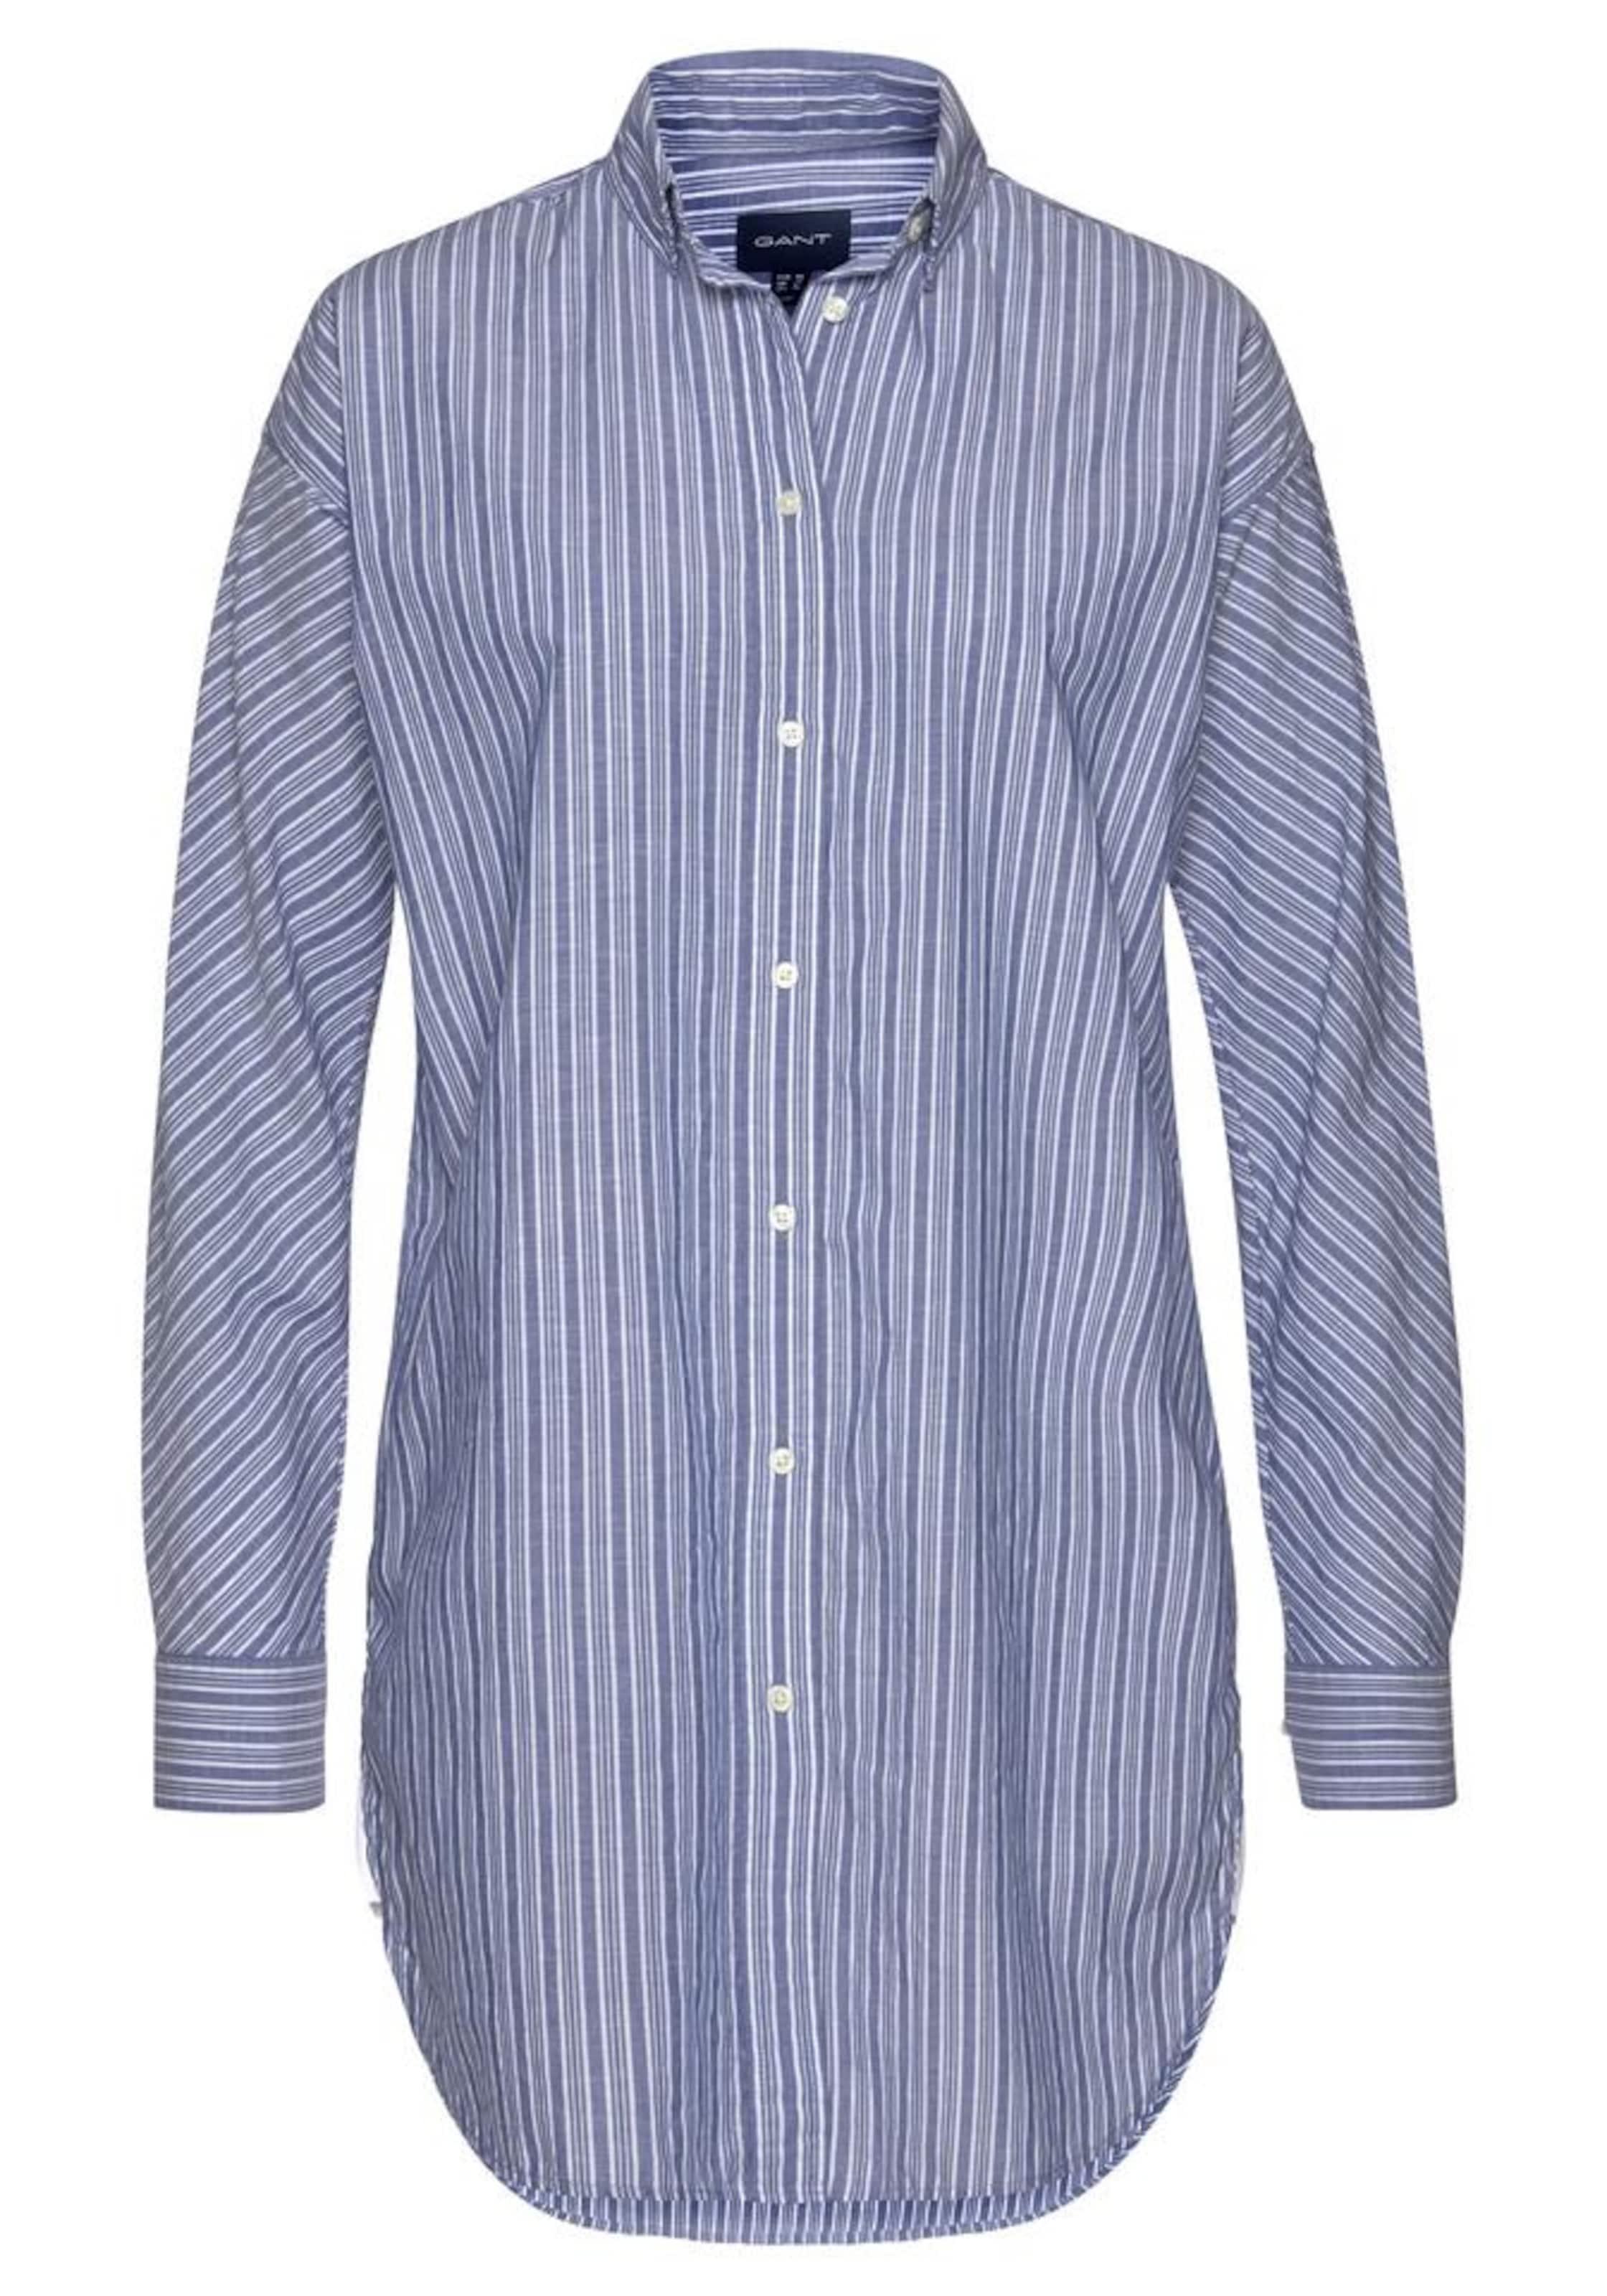 In Gant Gant TaubenblauWeiß Hemdbluse Hemdbluse ZuiPXOTk